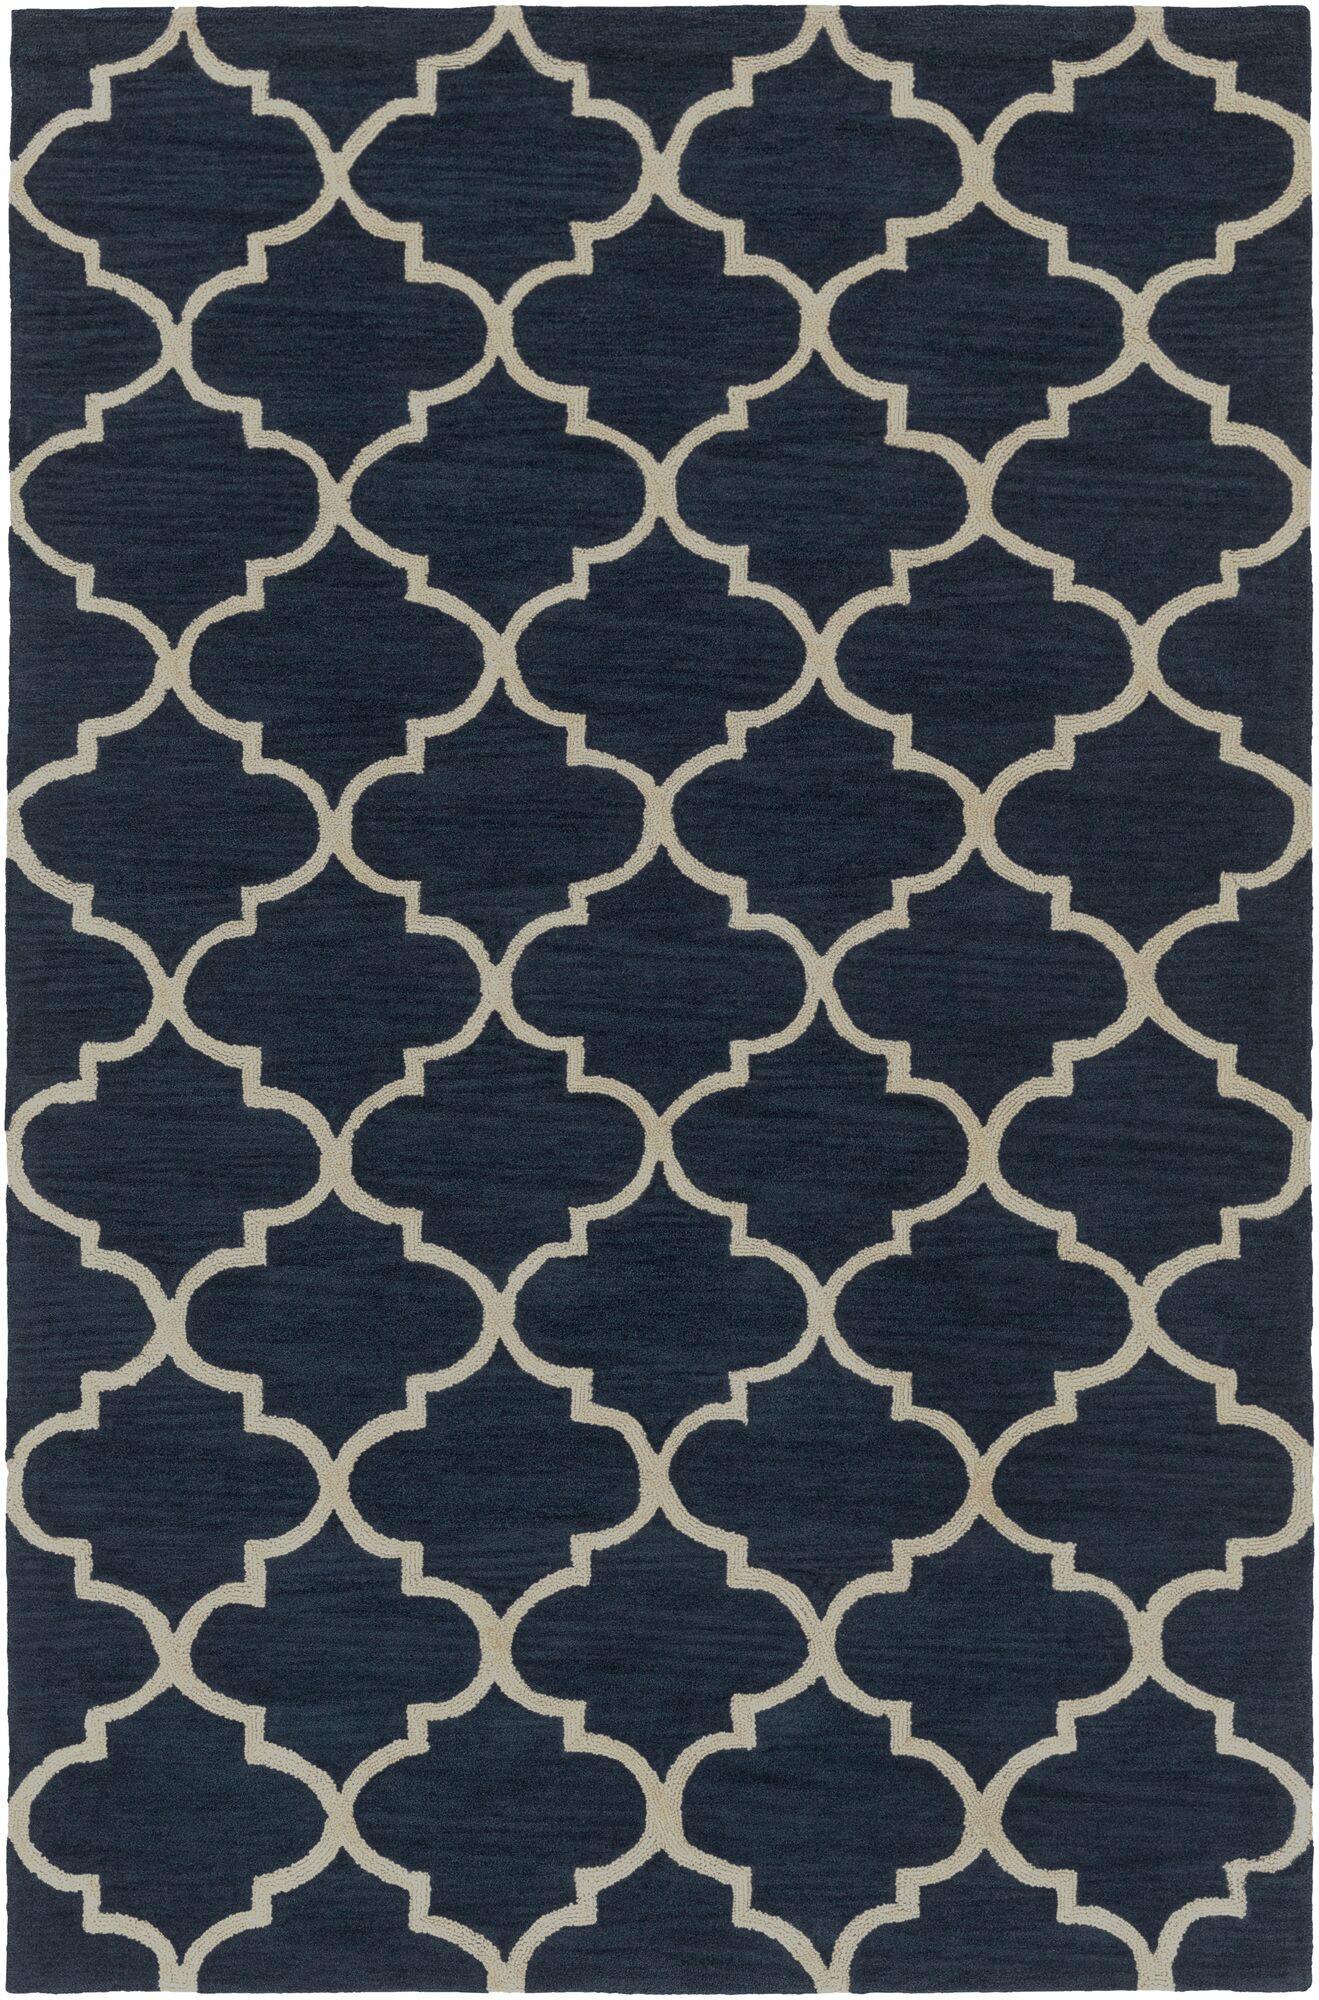 Goshen Hand Tufted Navy/Ivory Area Rug Rug Size: Rectangle 2' x 3'